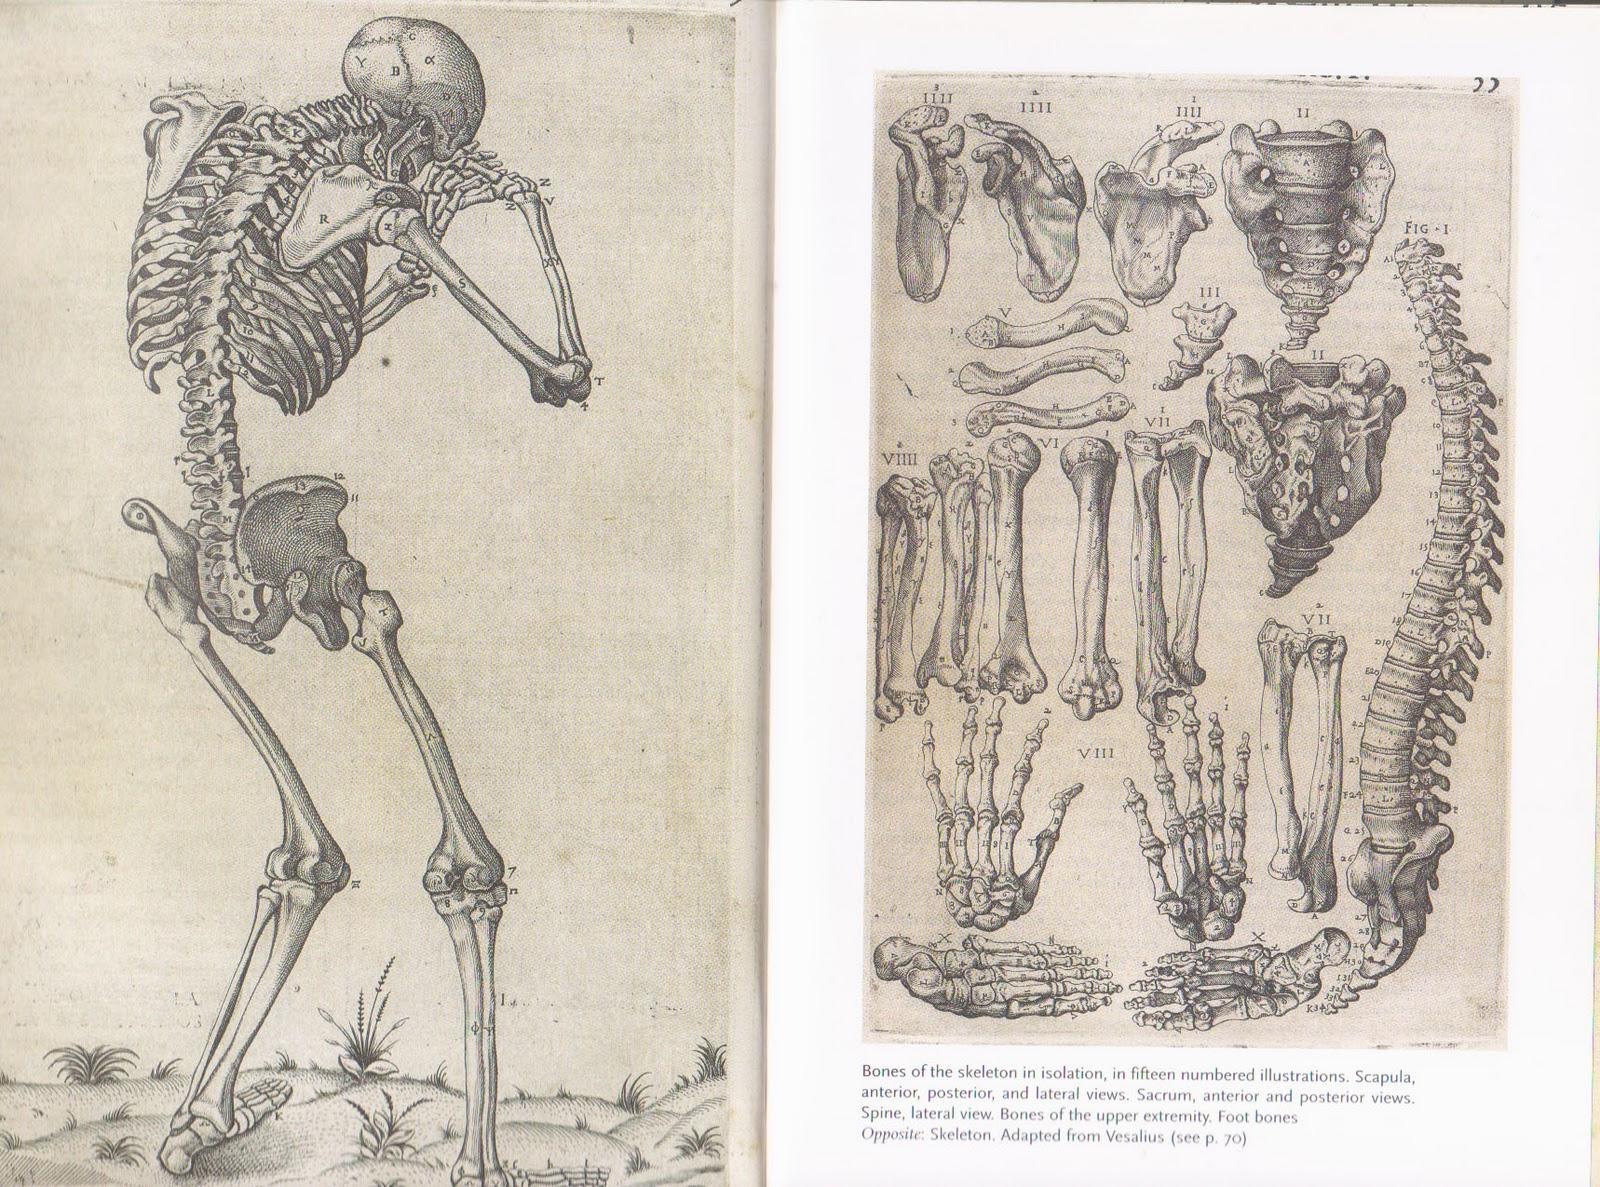 http://3.bp.blogspot.com/-2h4xAEGTcRo/TVgzlANNXpI/AAAAAAAAALo/l-nc2Fhm8z8/s1600/Human+Anatomy.3.jpg